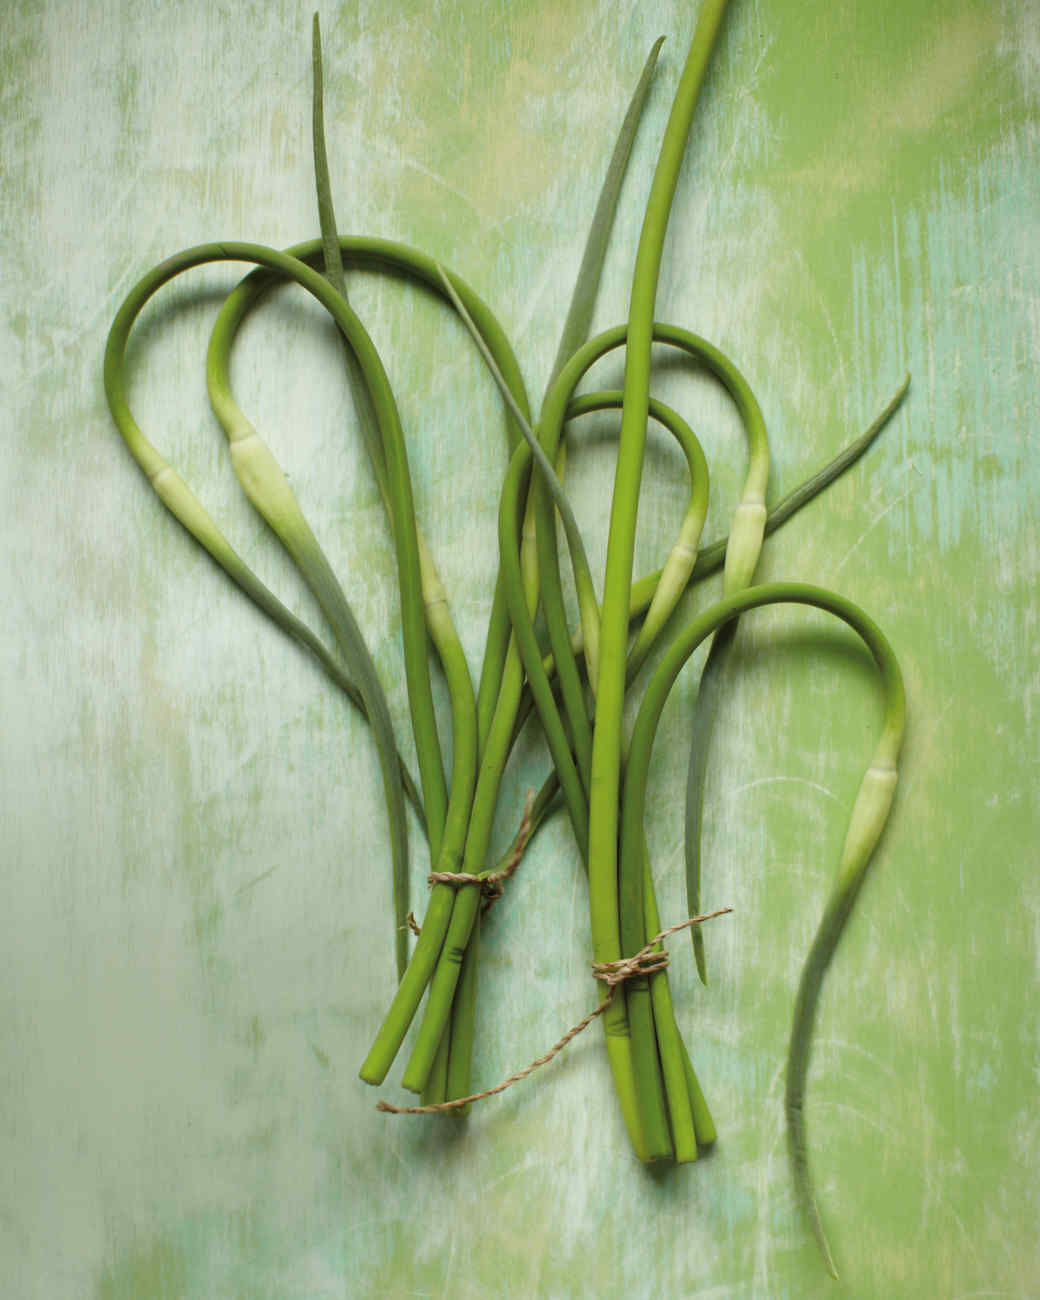 garlic-scapes-mld107571.jpg